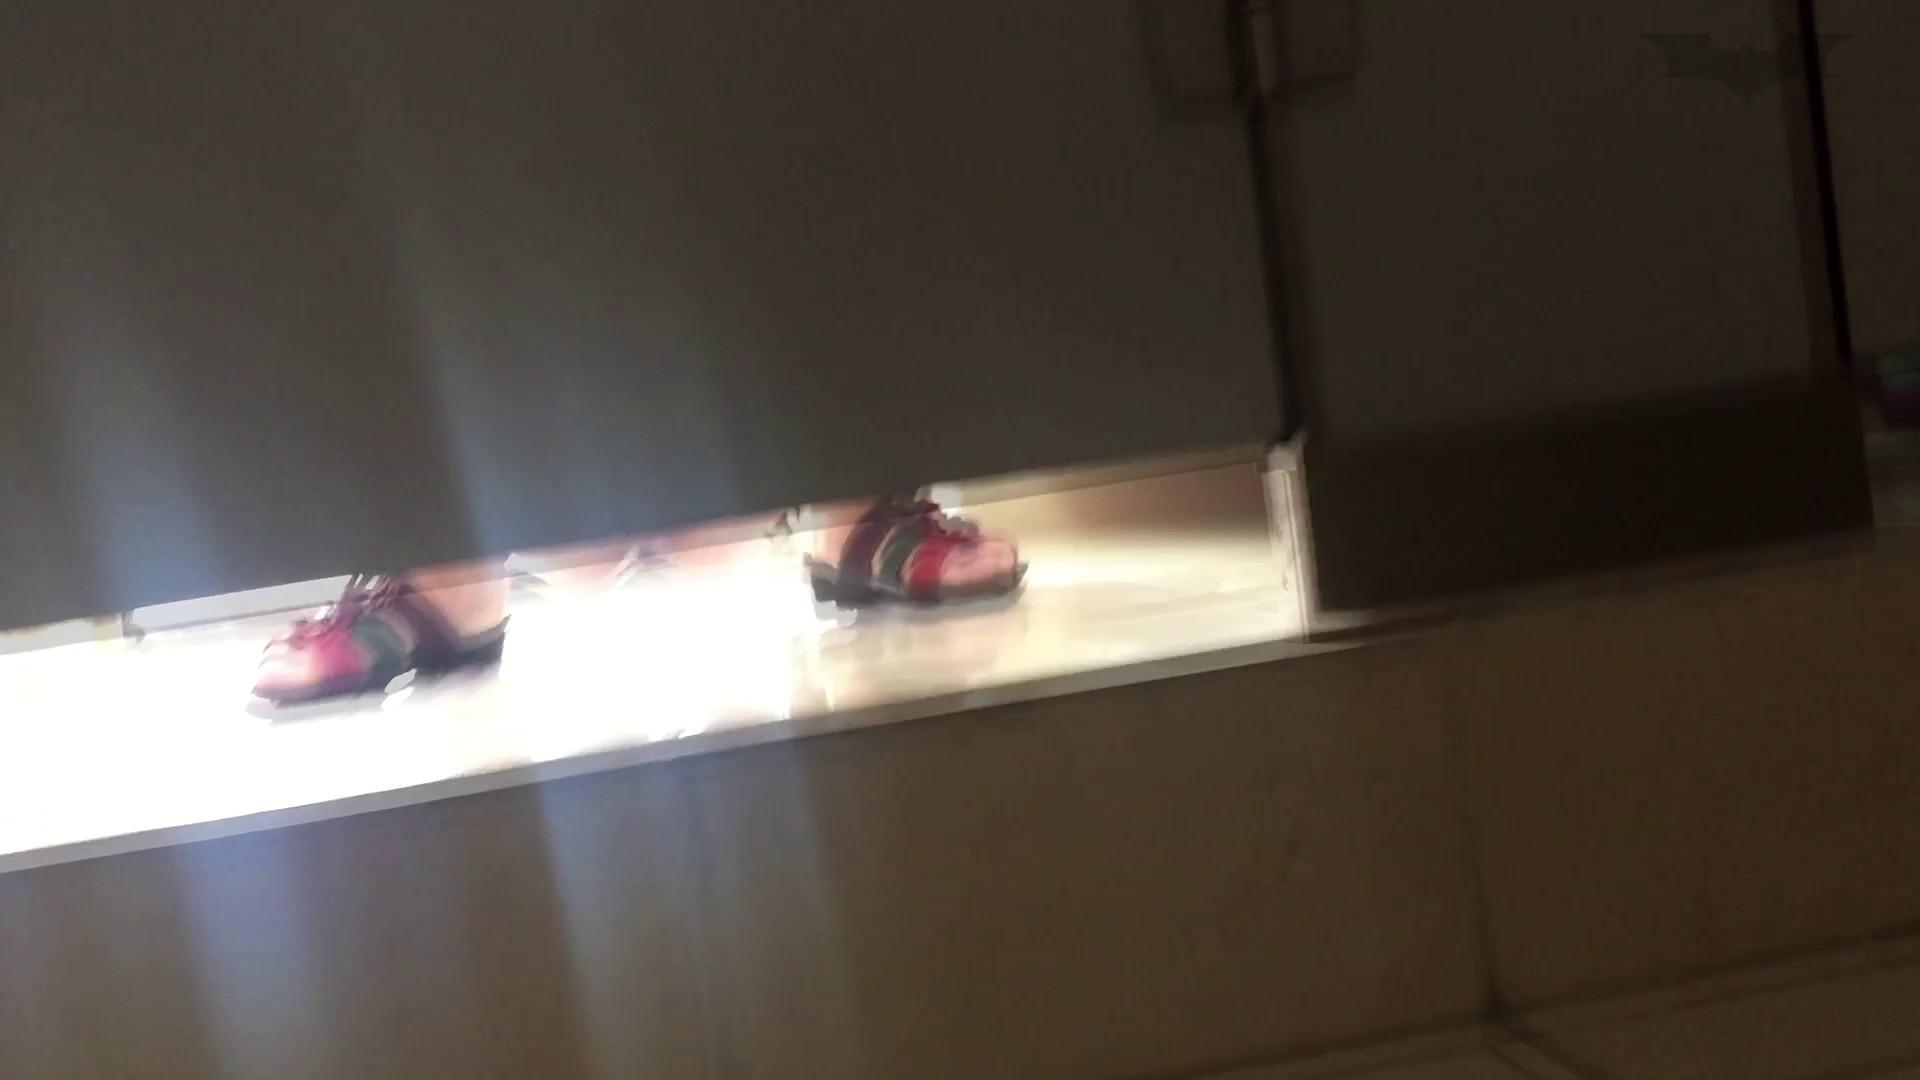 JD盗撮 美女の洗面所の秘密 Vol.74 美肌 オマンコ動画キャプチャ 109画像 85